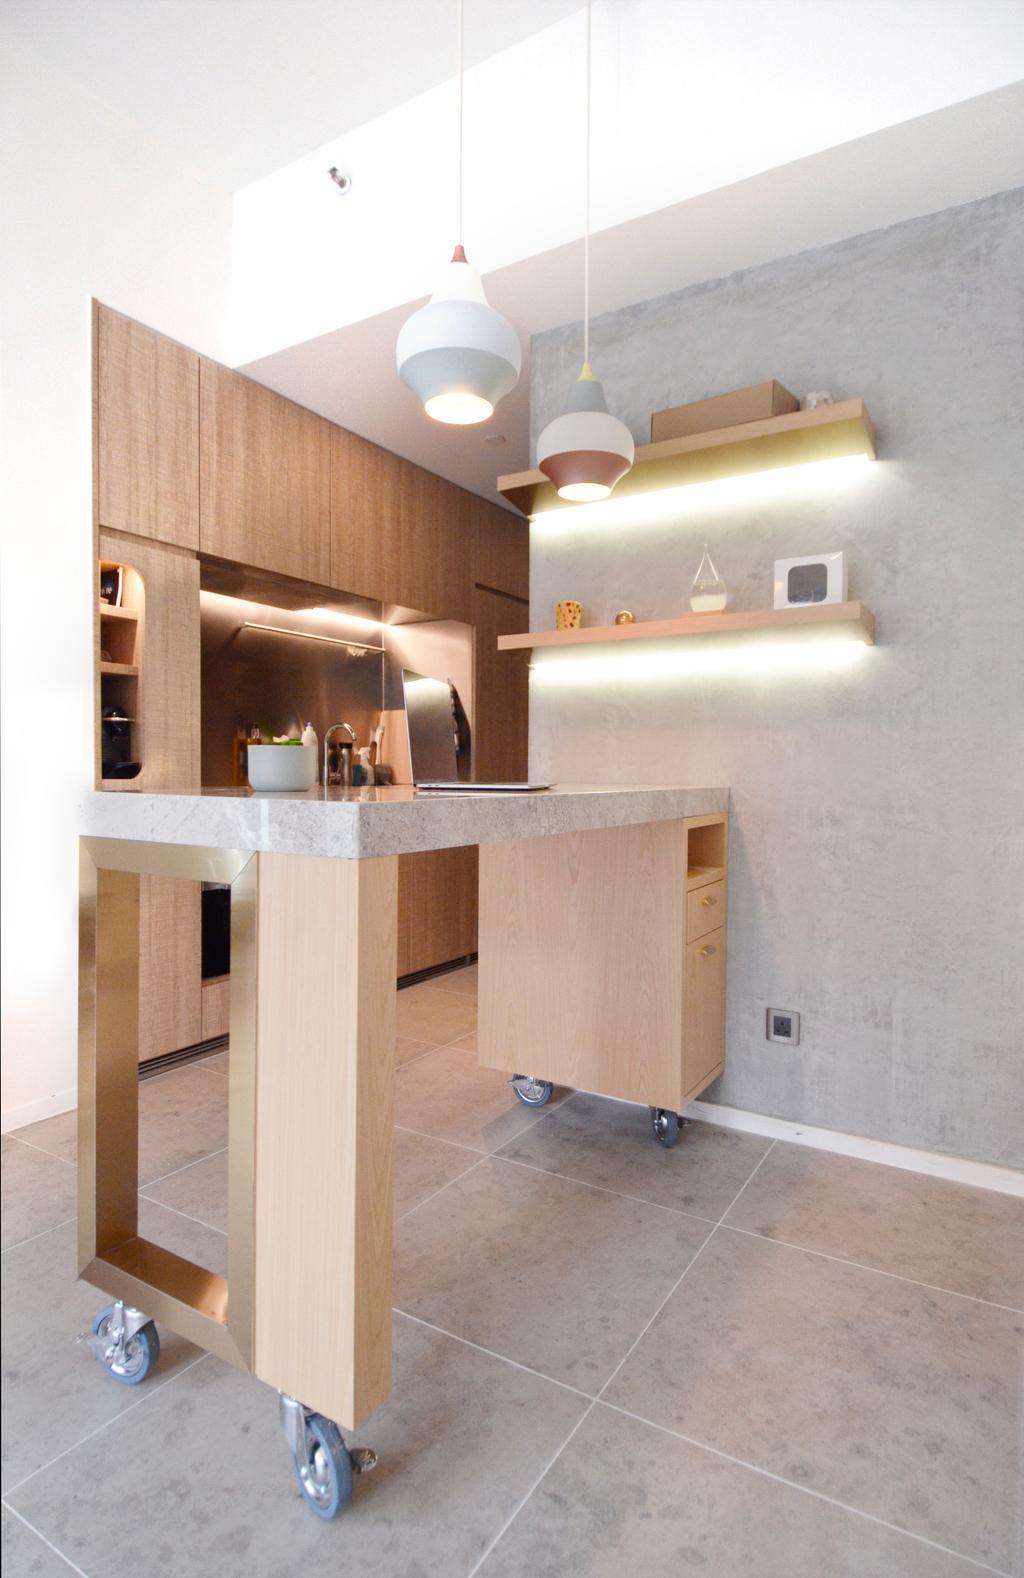 私家樓, 飯廳, 瑧璈, 室內設計師, MAD Studio Limited